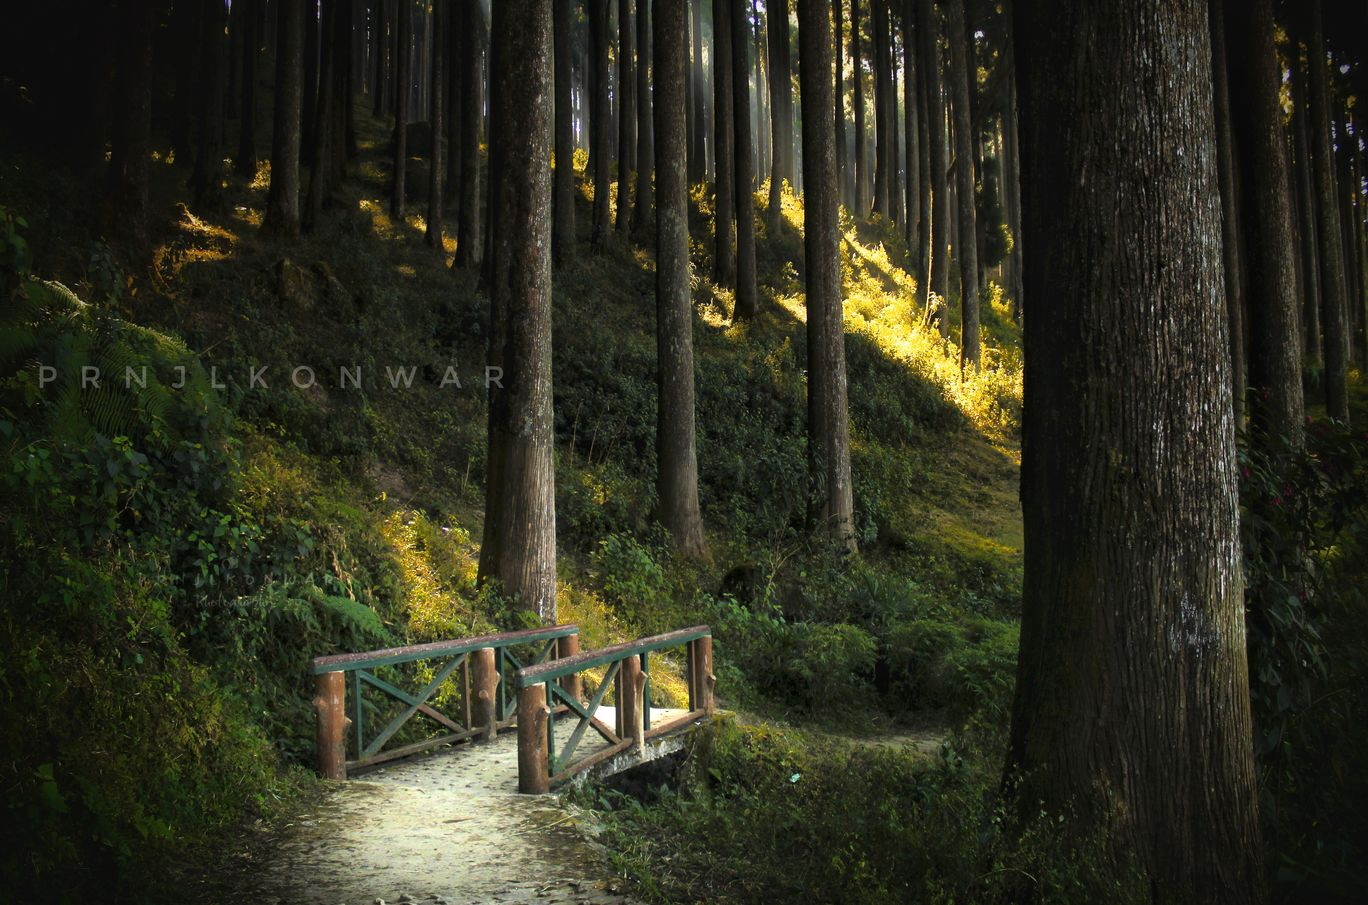 Photo of Lamahatta Park By Prnjl KoNwar